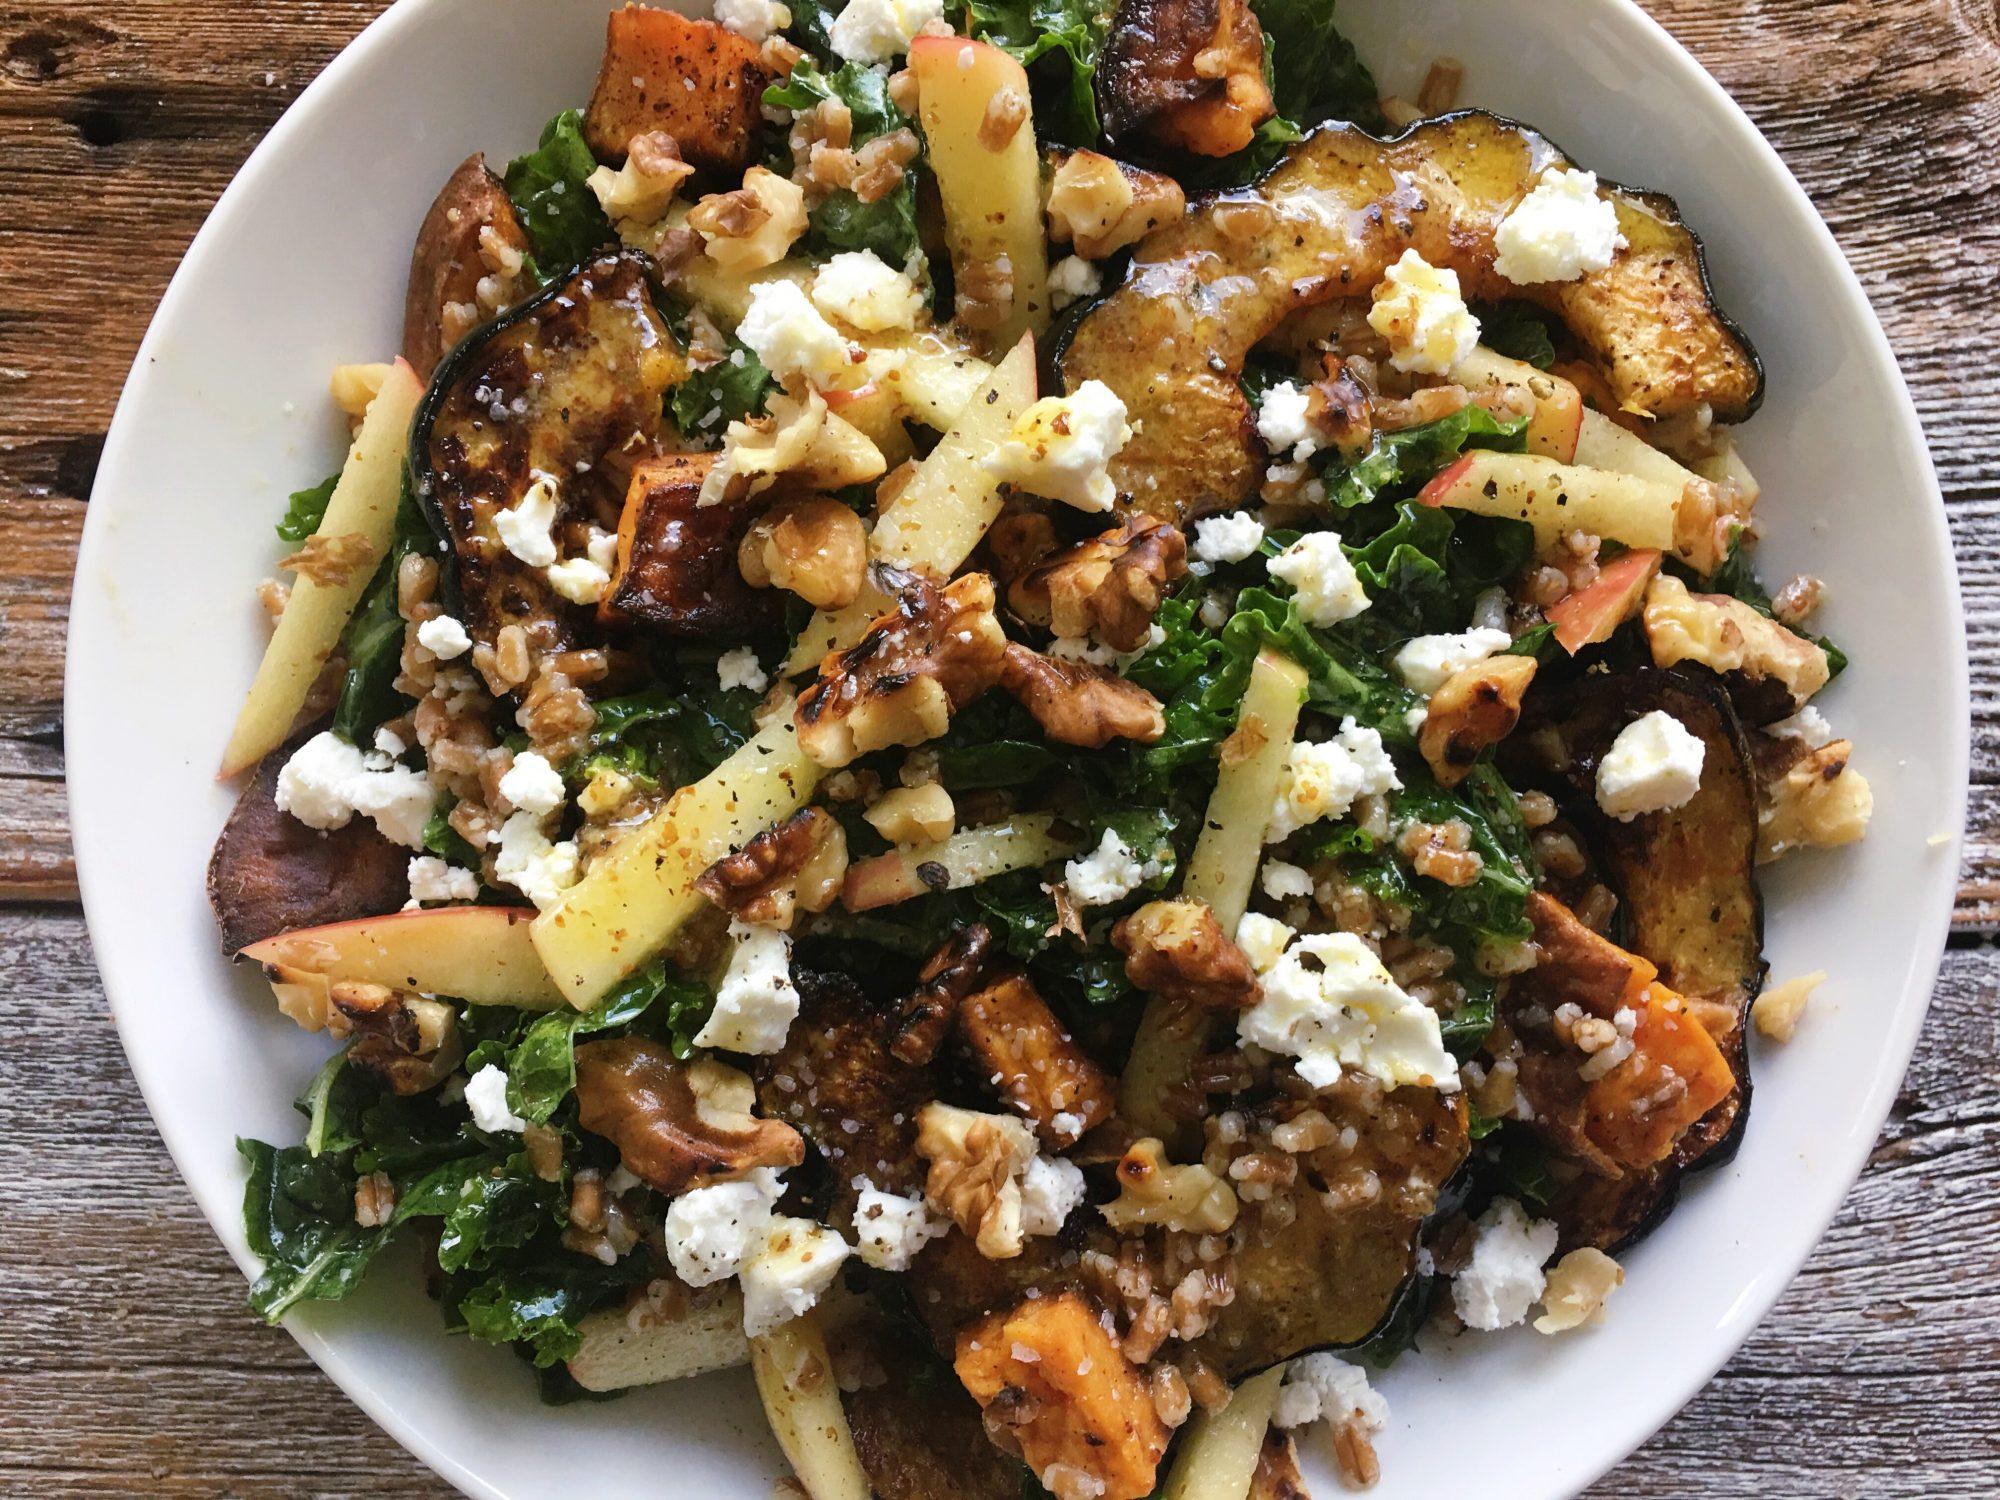 Kale Salad with Acorn Squash, Wheatberries, Apples, and Maple-Dijon Vinaigrette